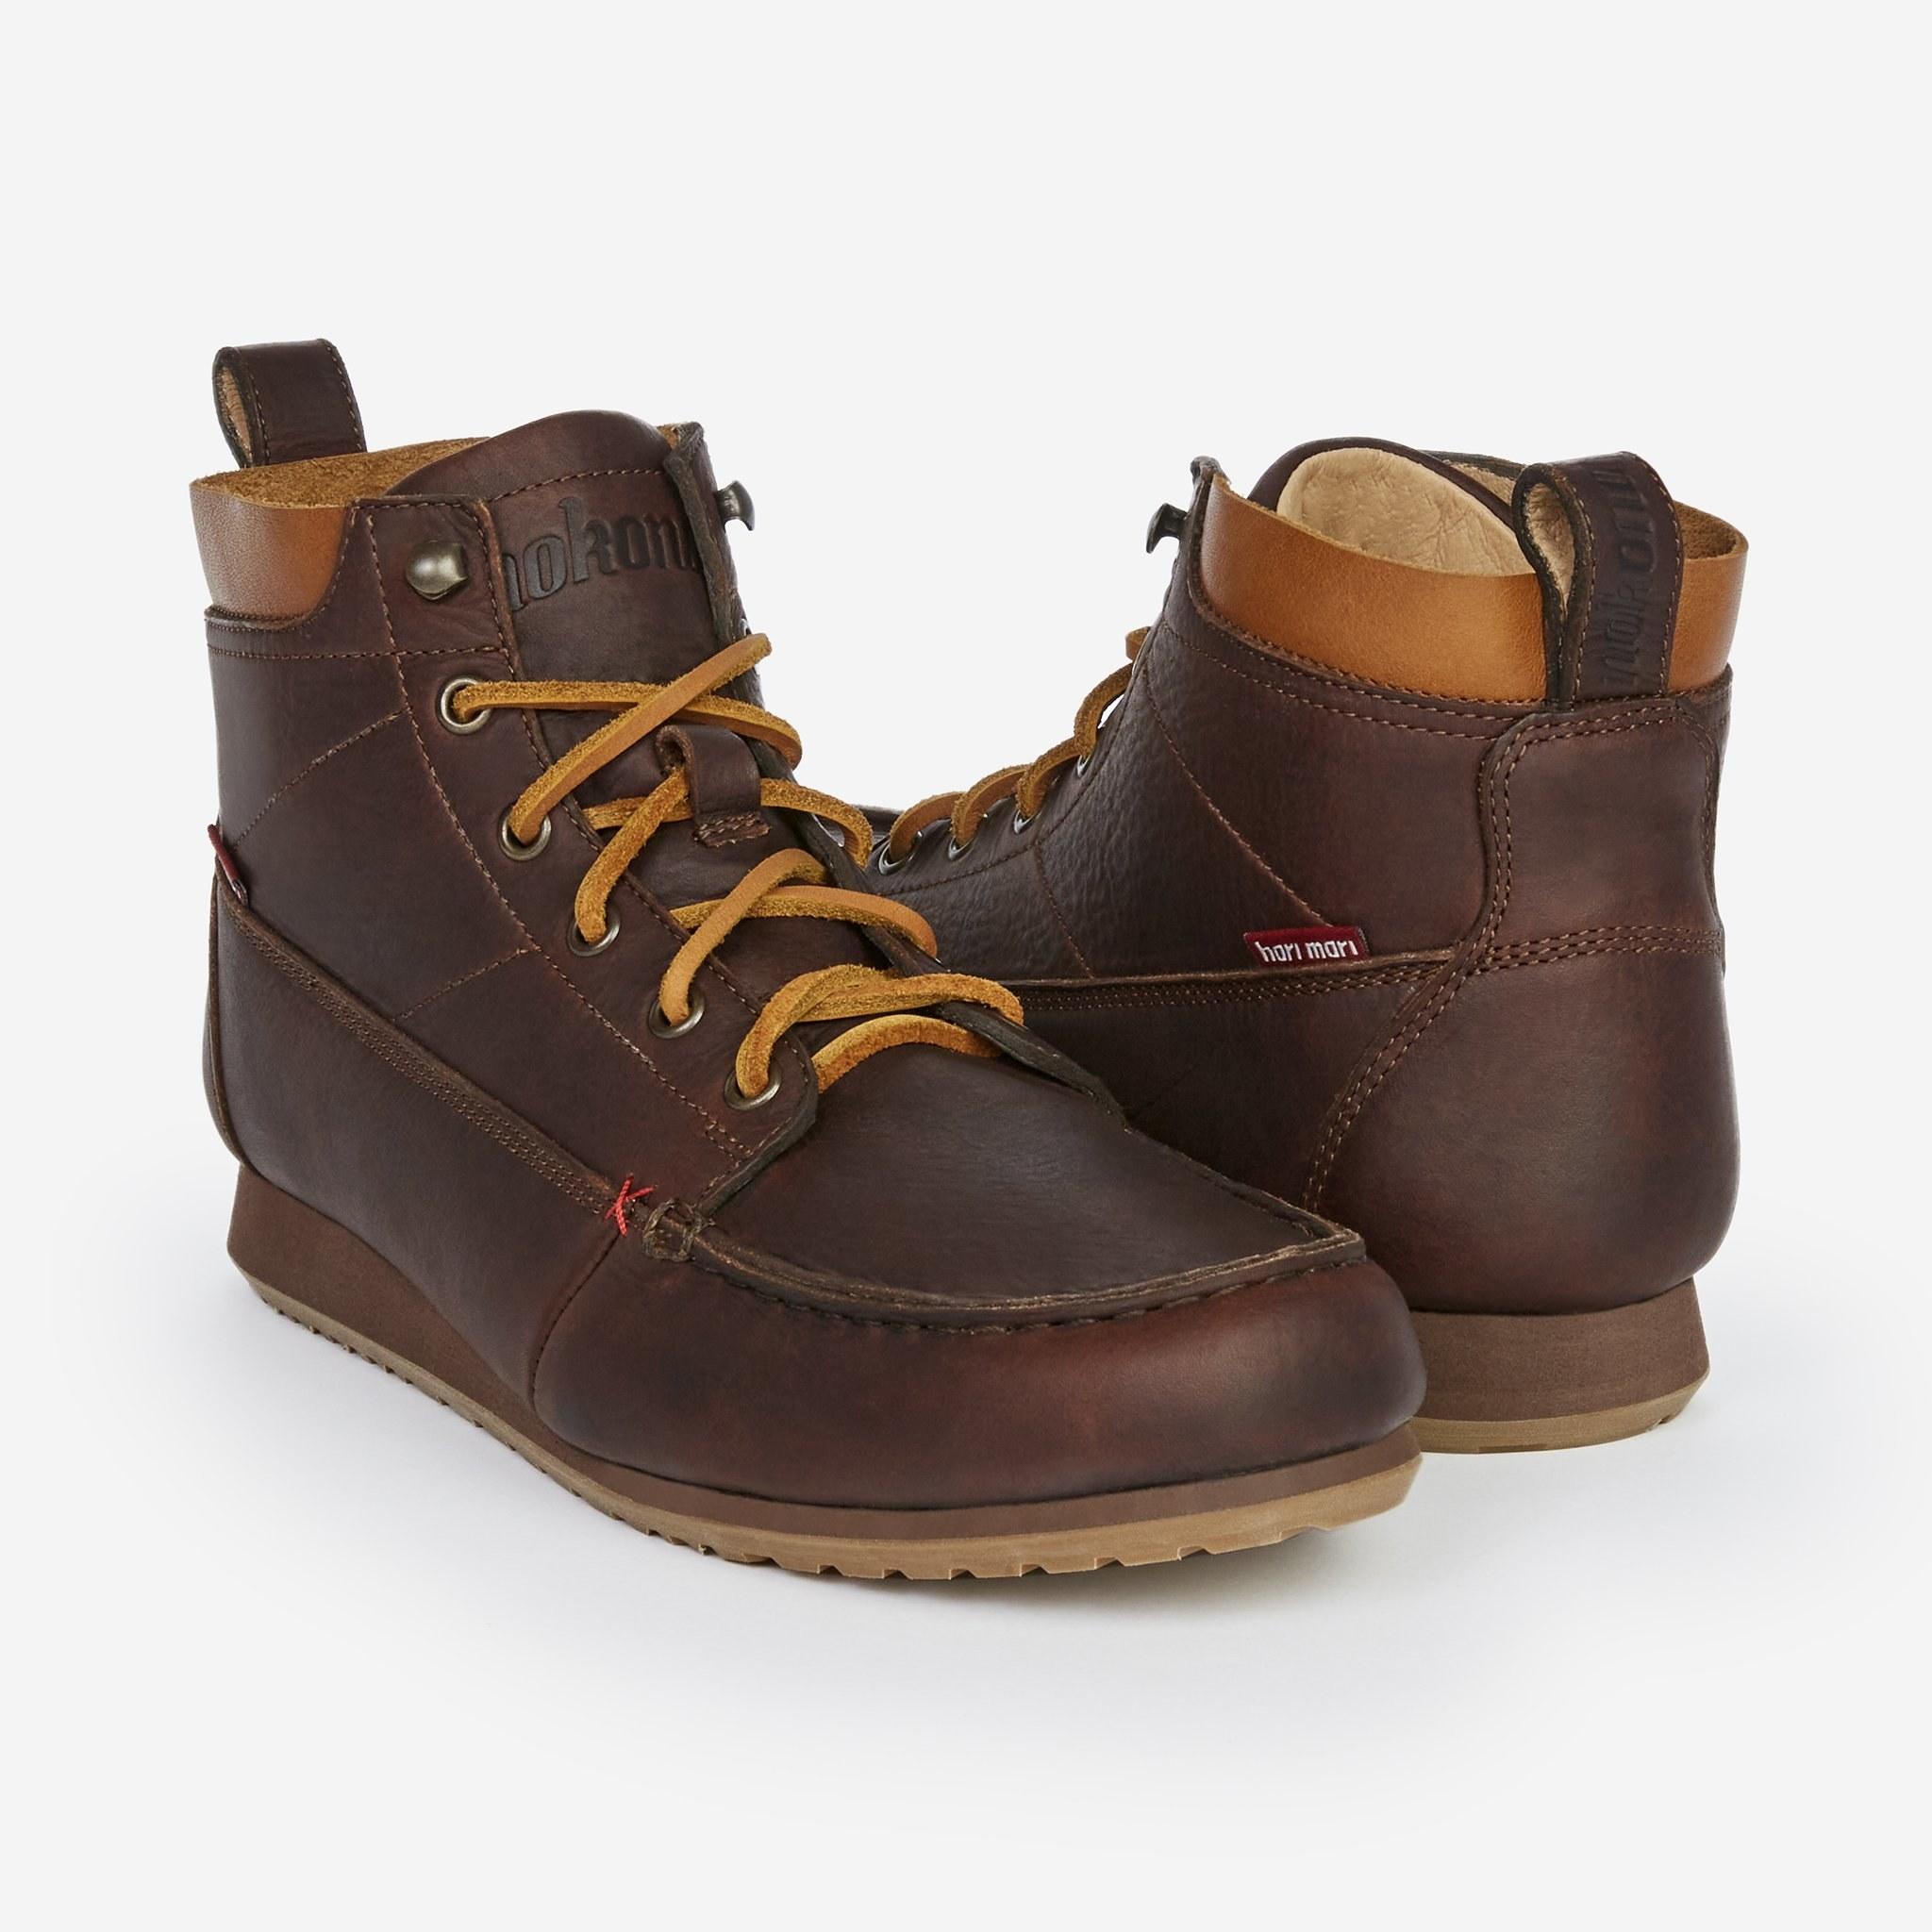 Hari Mari chukka boots